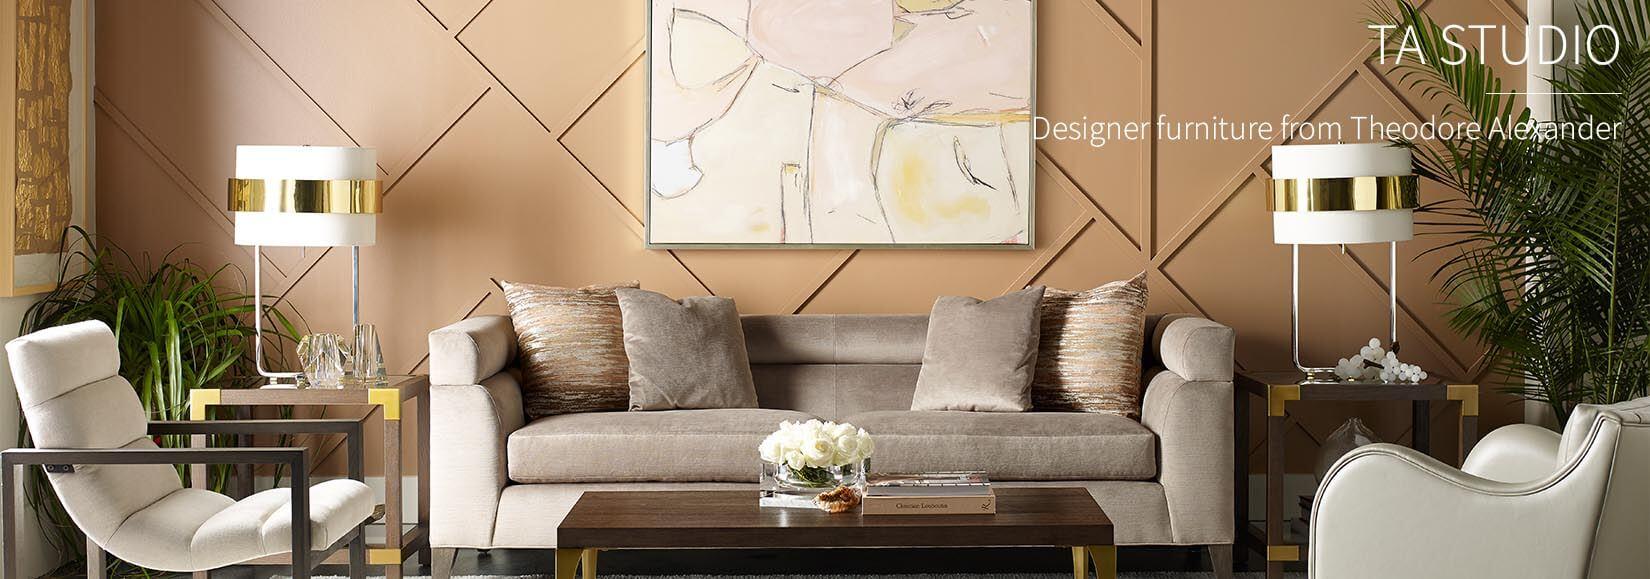 TA Studio Designer Furniture by Theodore Alexander